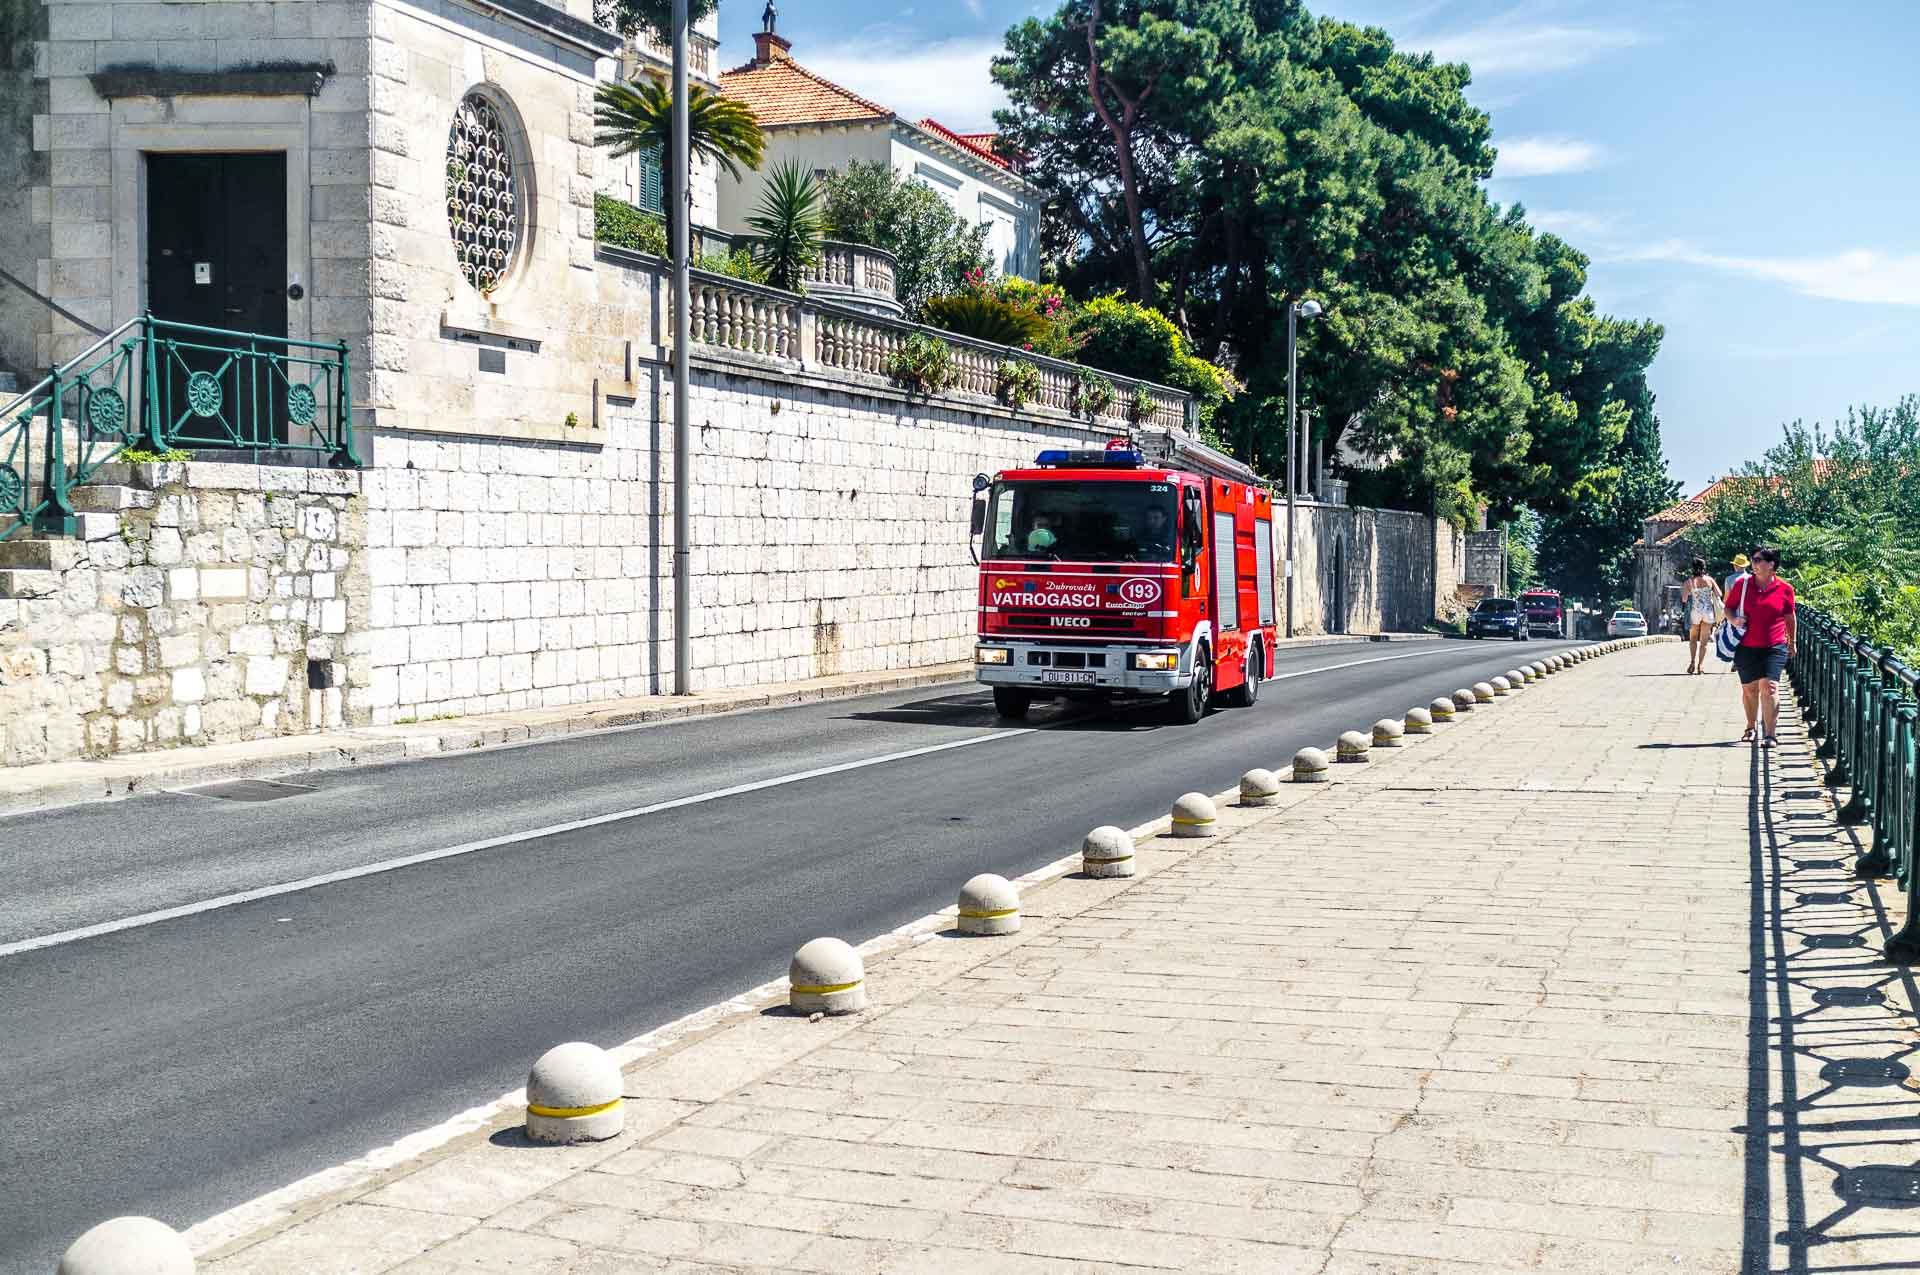 08-24-Dubrovnik-03